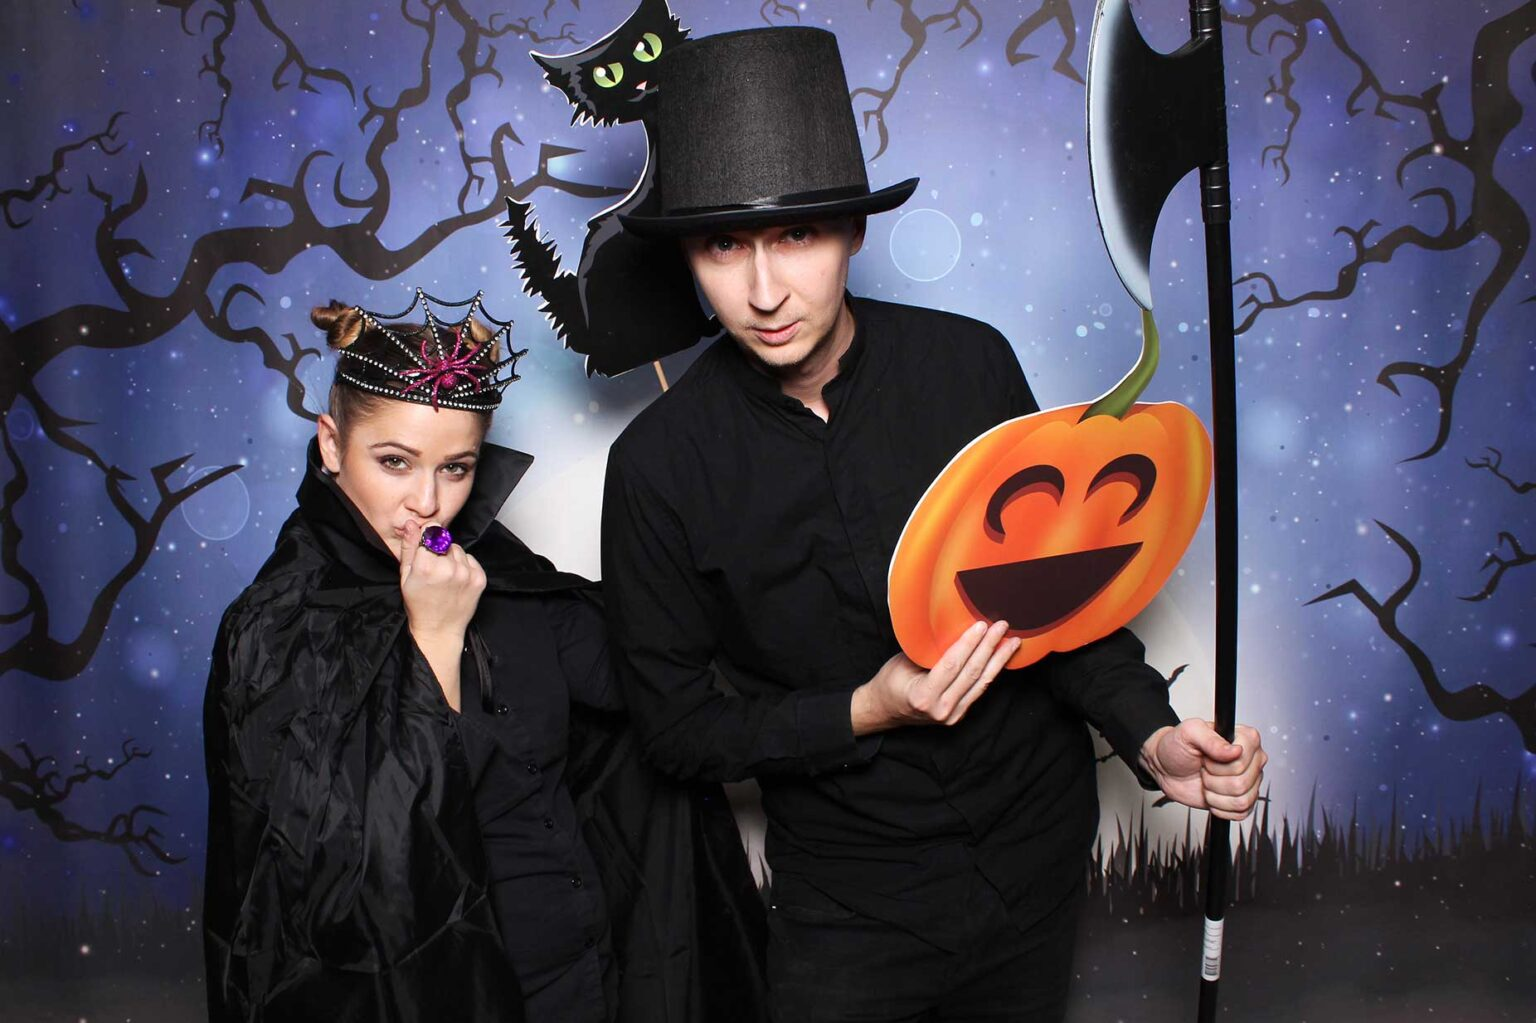 Pozadie Halloween - tekvica - rekvizity fotobox Bratislava - fotokútik.